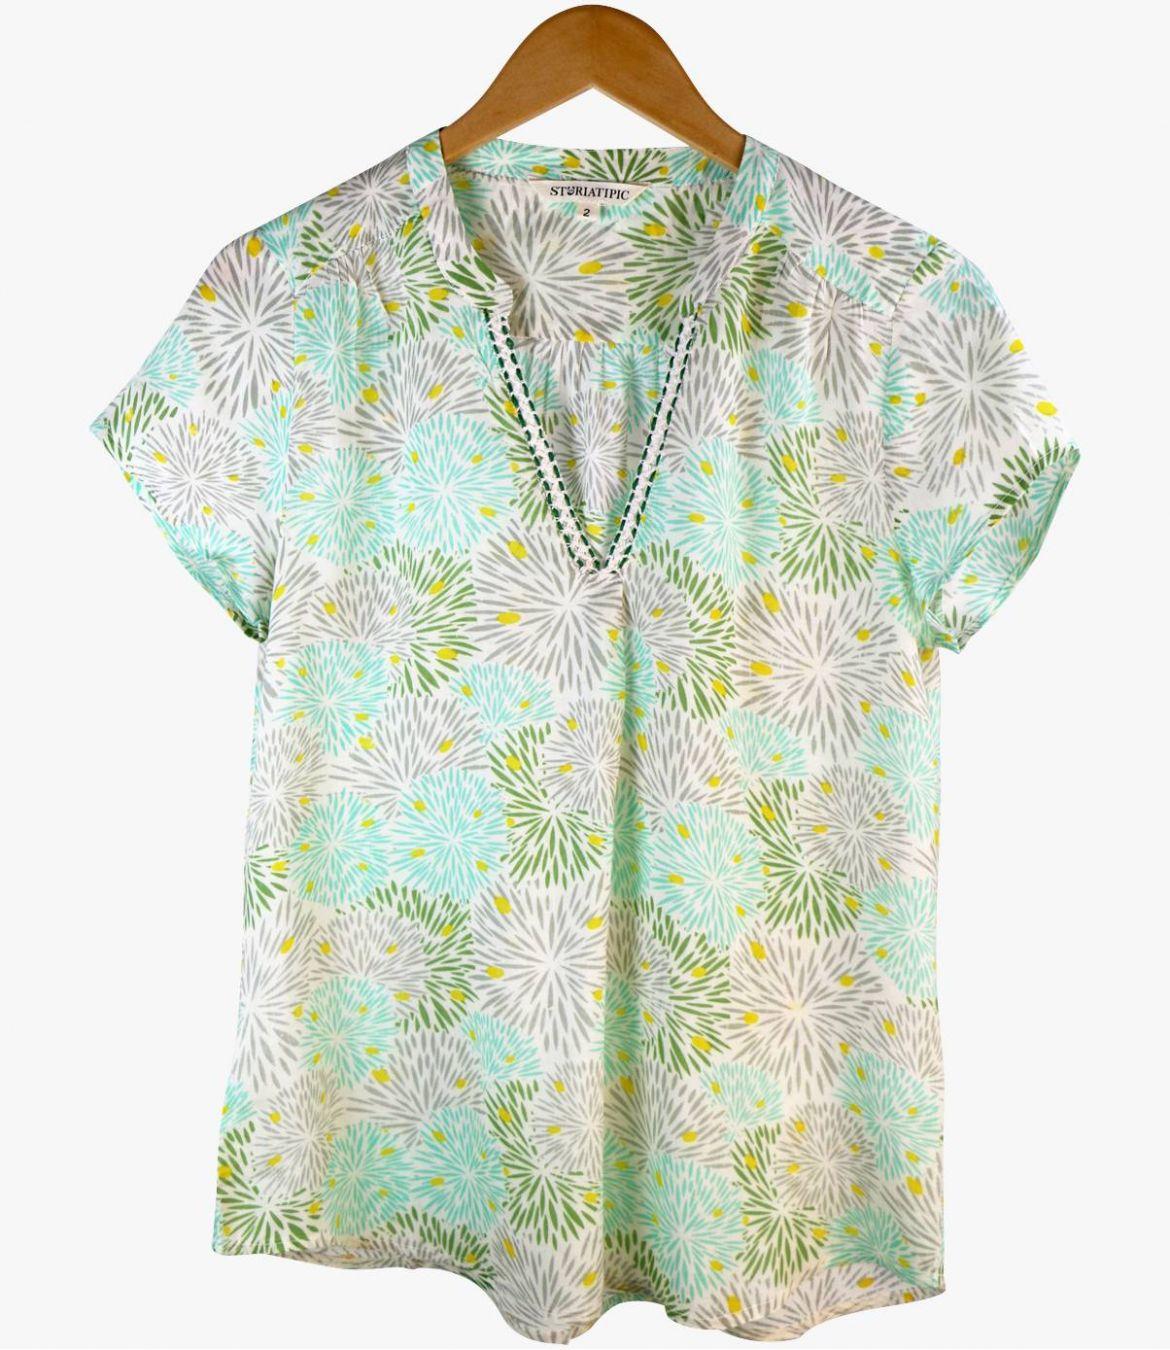 ZOE ECLAT Women's Modal T-shirt Storiatipic - 7